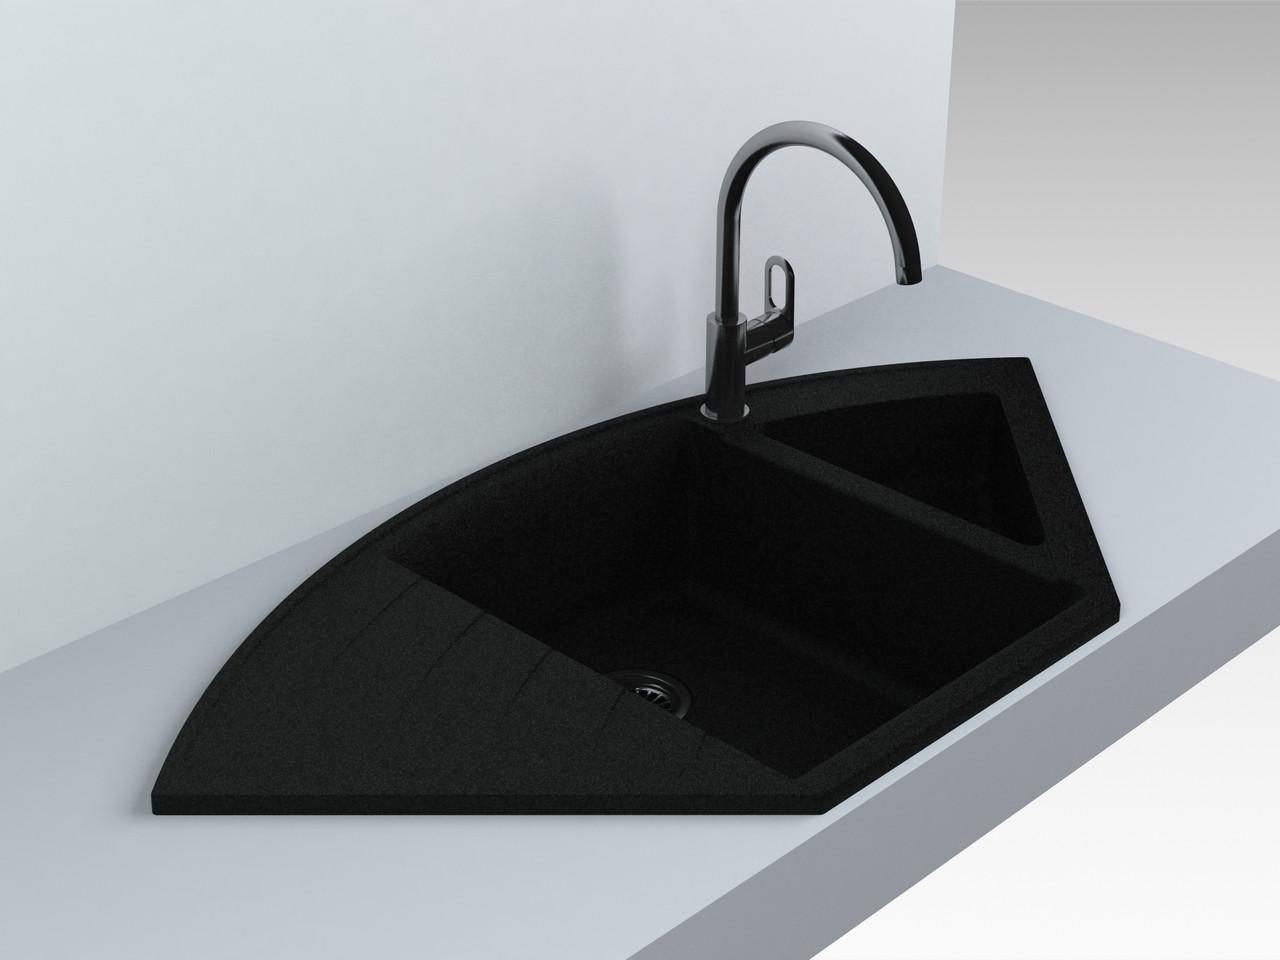 Кухонная мойка угловая из кварца 1100*575*215 мм Miraggio Europe черный